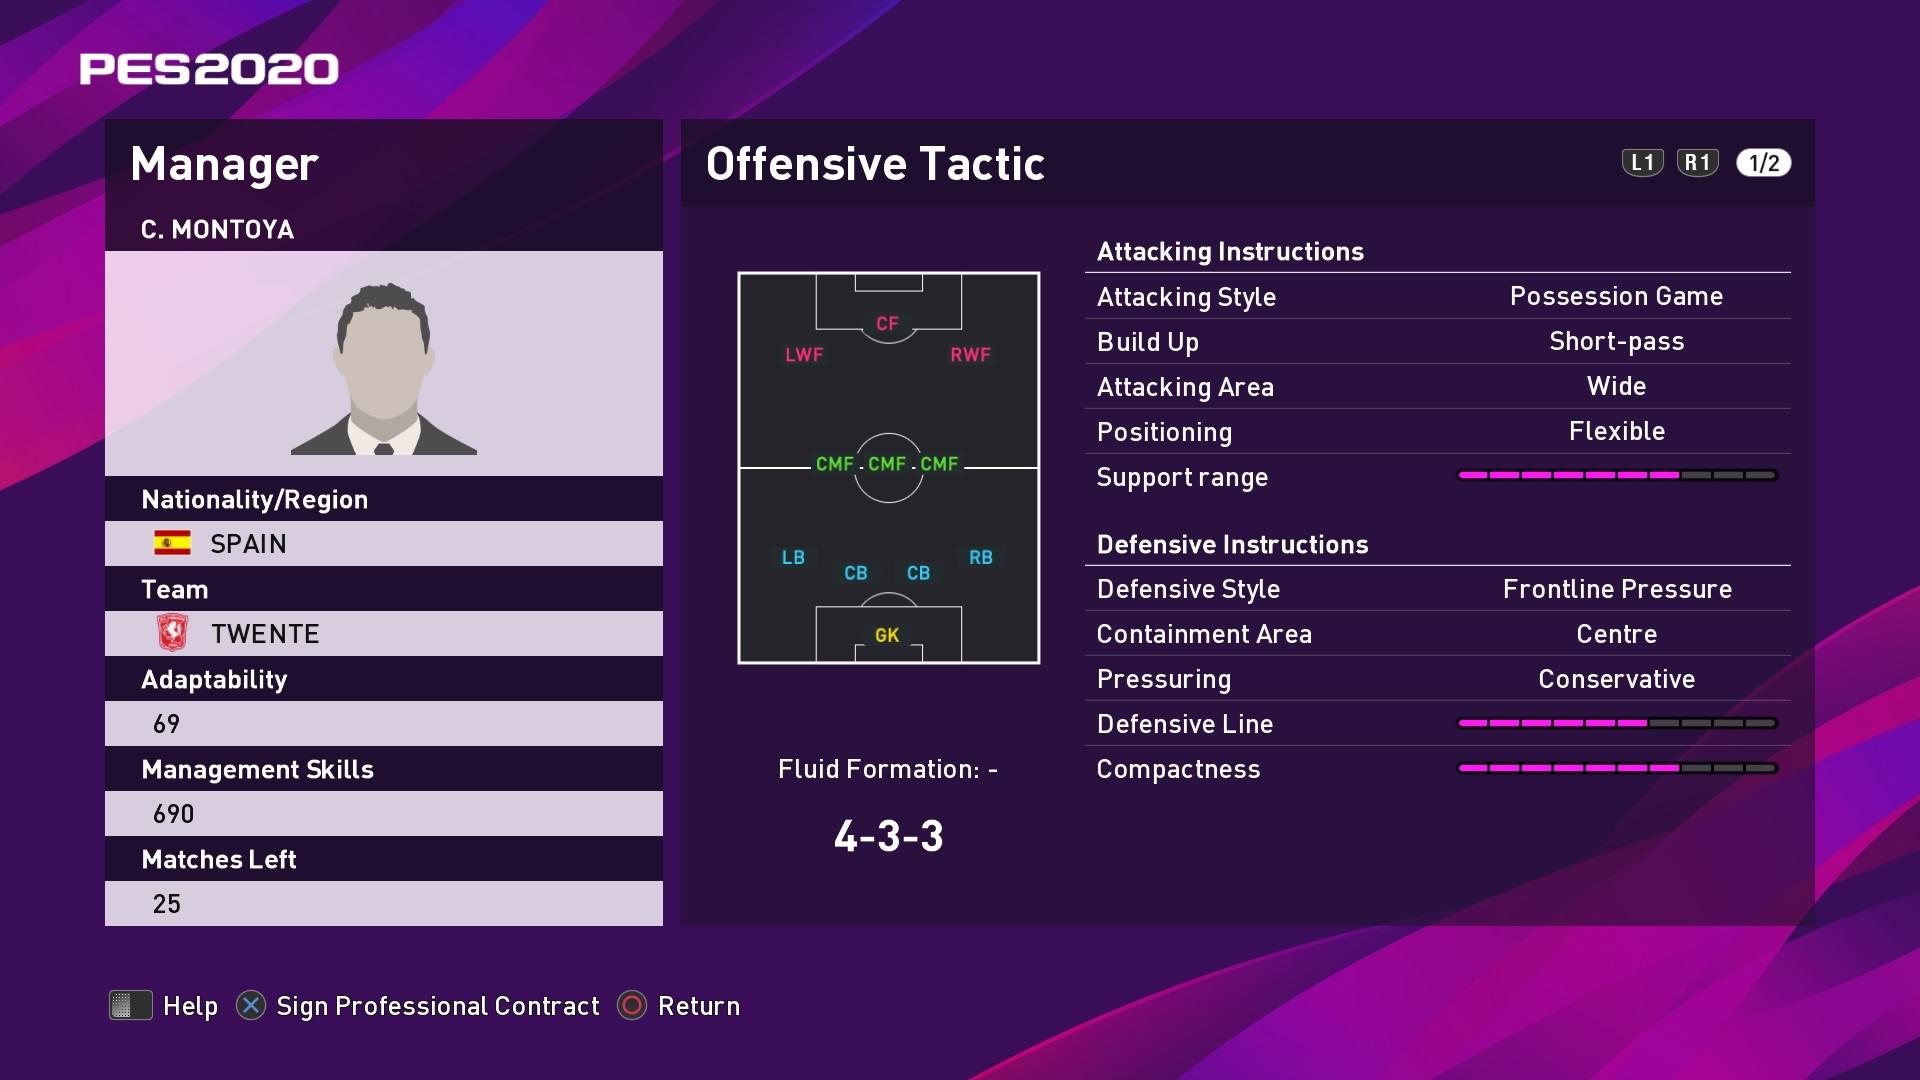 C. Montoya (Gonzalo) Offensive Tactic in PES 2020 myClub